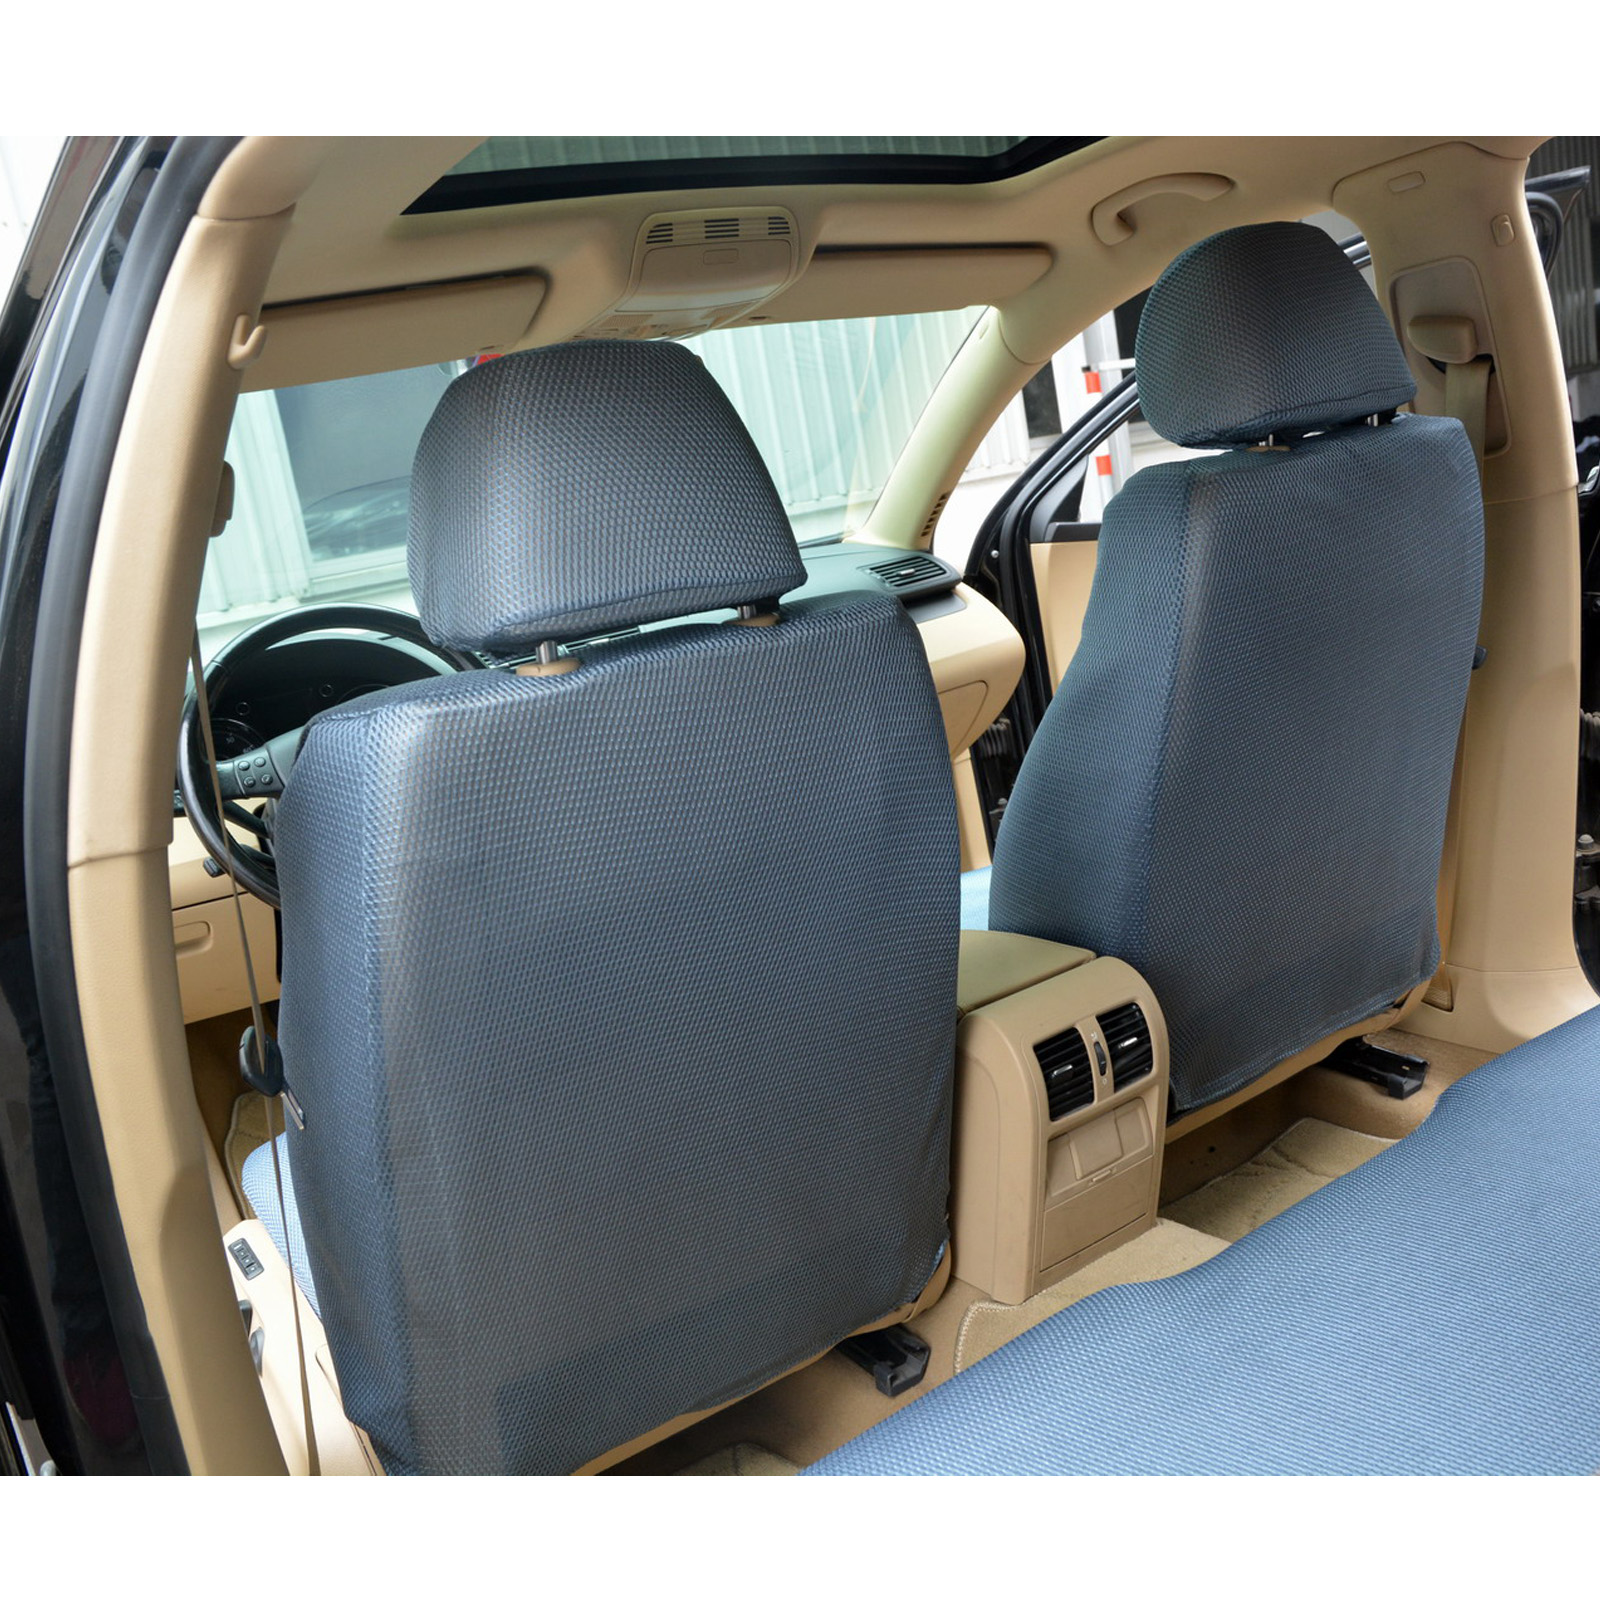 auto schonbezug 12 teillige sitzbez ge f r auto universal schwarz grau scsc0018 ebay. Black Bedroom Furniture Sets. Home Design Ideas